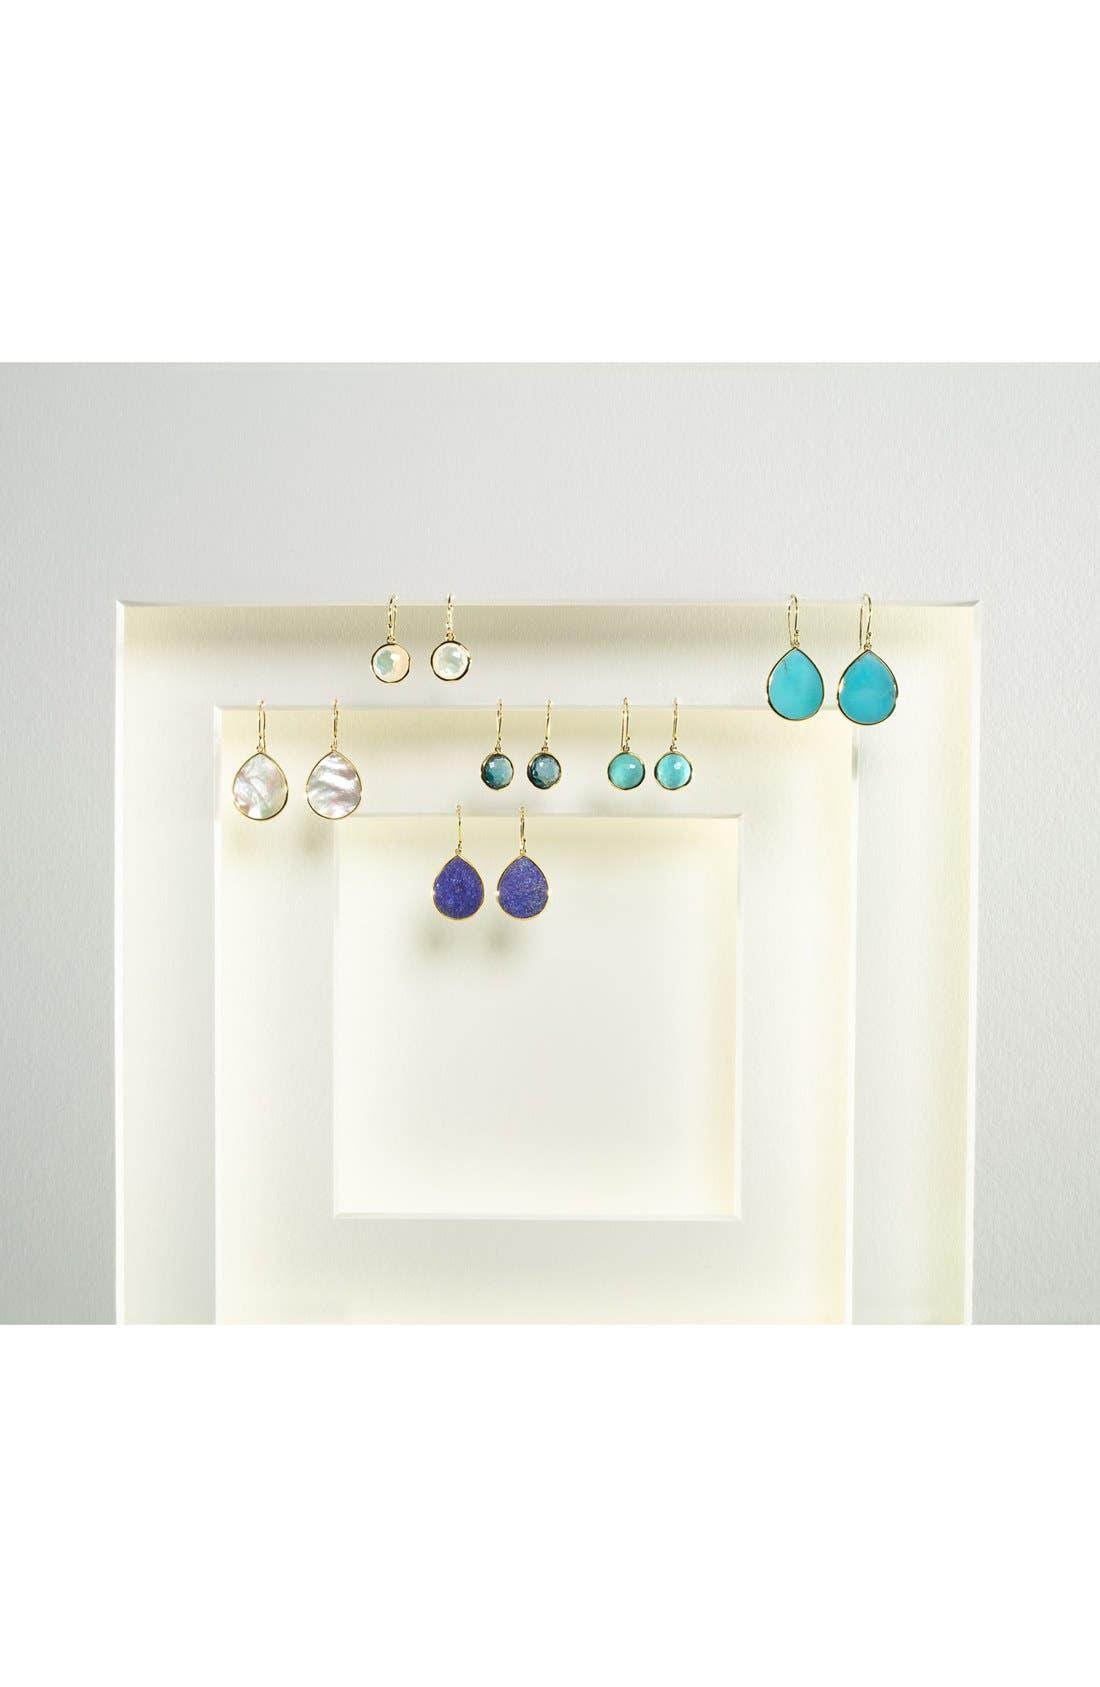 'Rock Candy - Mini Lollipop' 18k Gold Drop Earrings,                             Alternate thumbnail 2, color,                             YELLOW GOLD/TURQUOISE